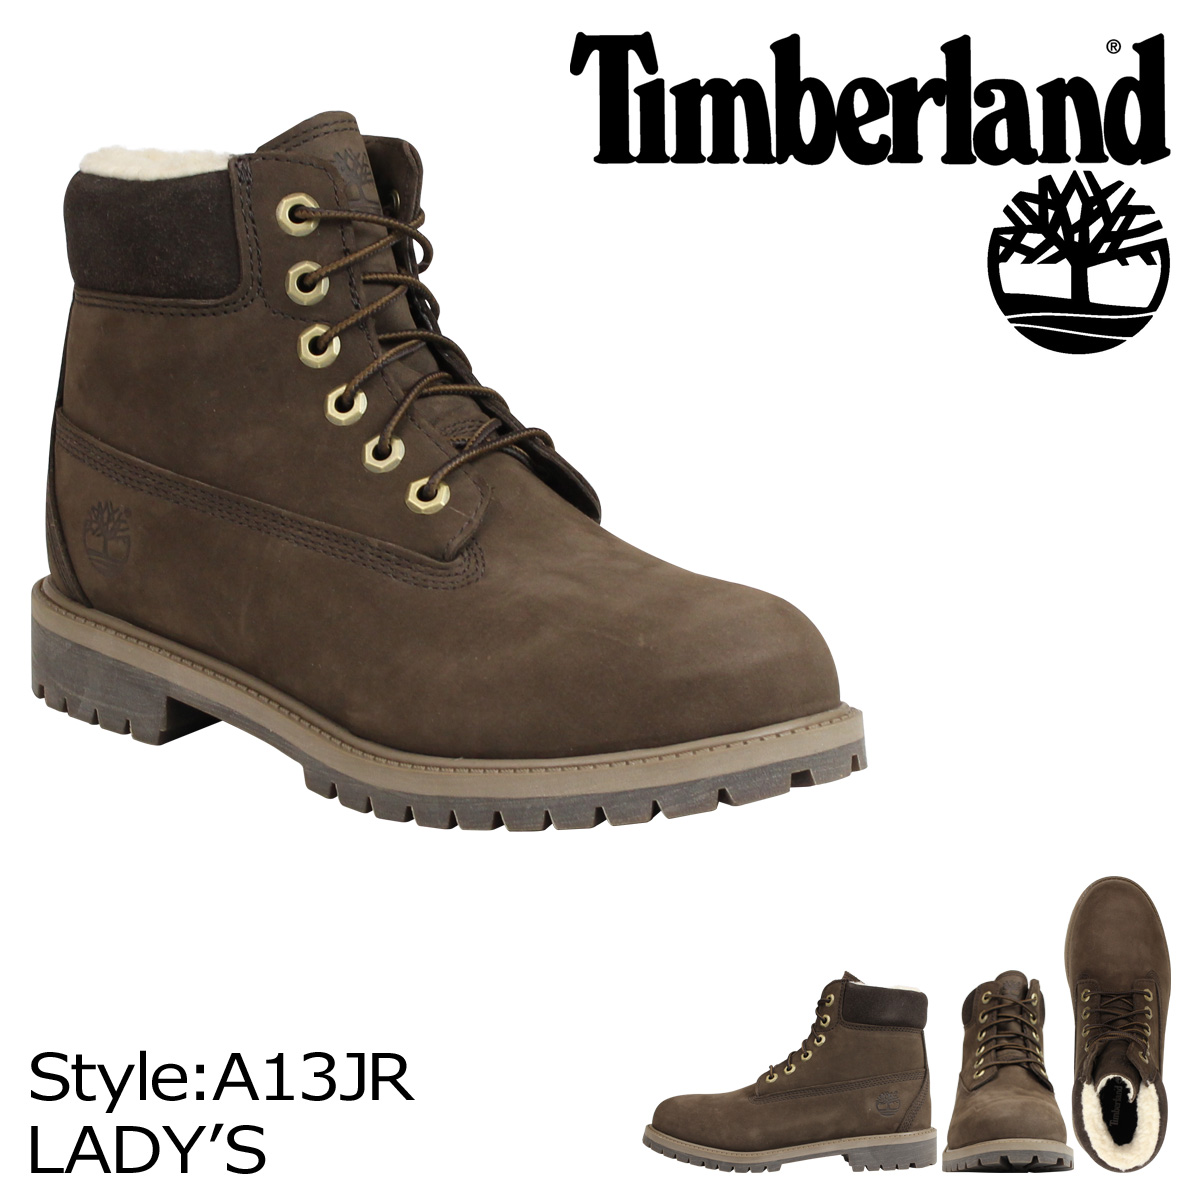 7a97d0715b Sugar Online Shop: Timberland-Timberland women's JUNIOR 6INCH PREMIUM WP  BOOT boots 6 inch premium waterproof A13JR Brown [10/15 new in stock] |  Rakuten ...